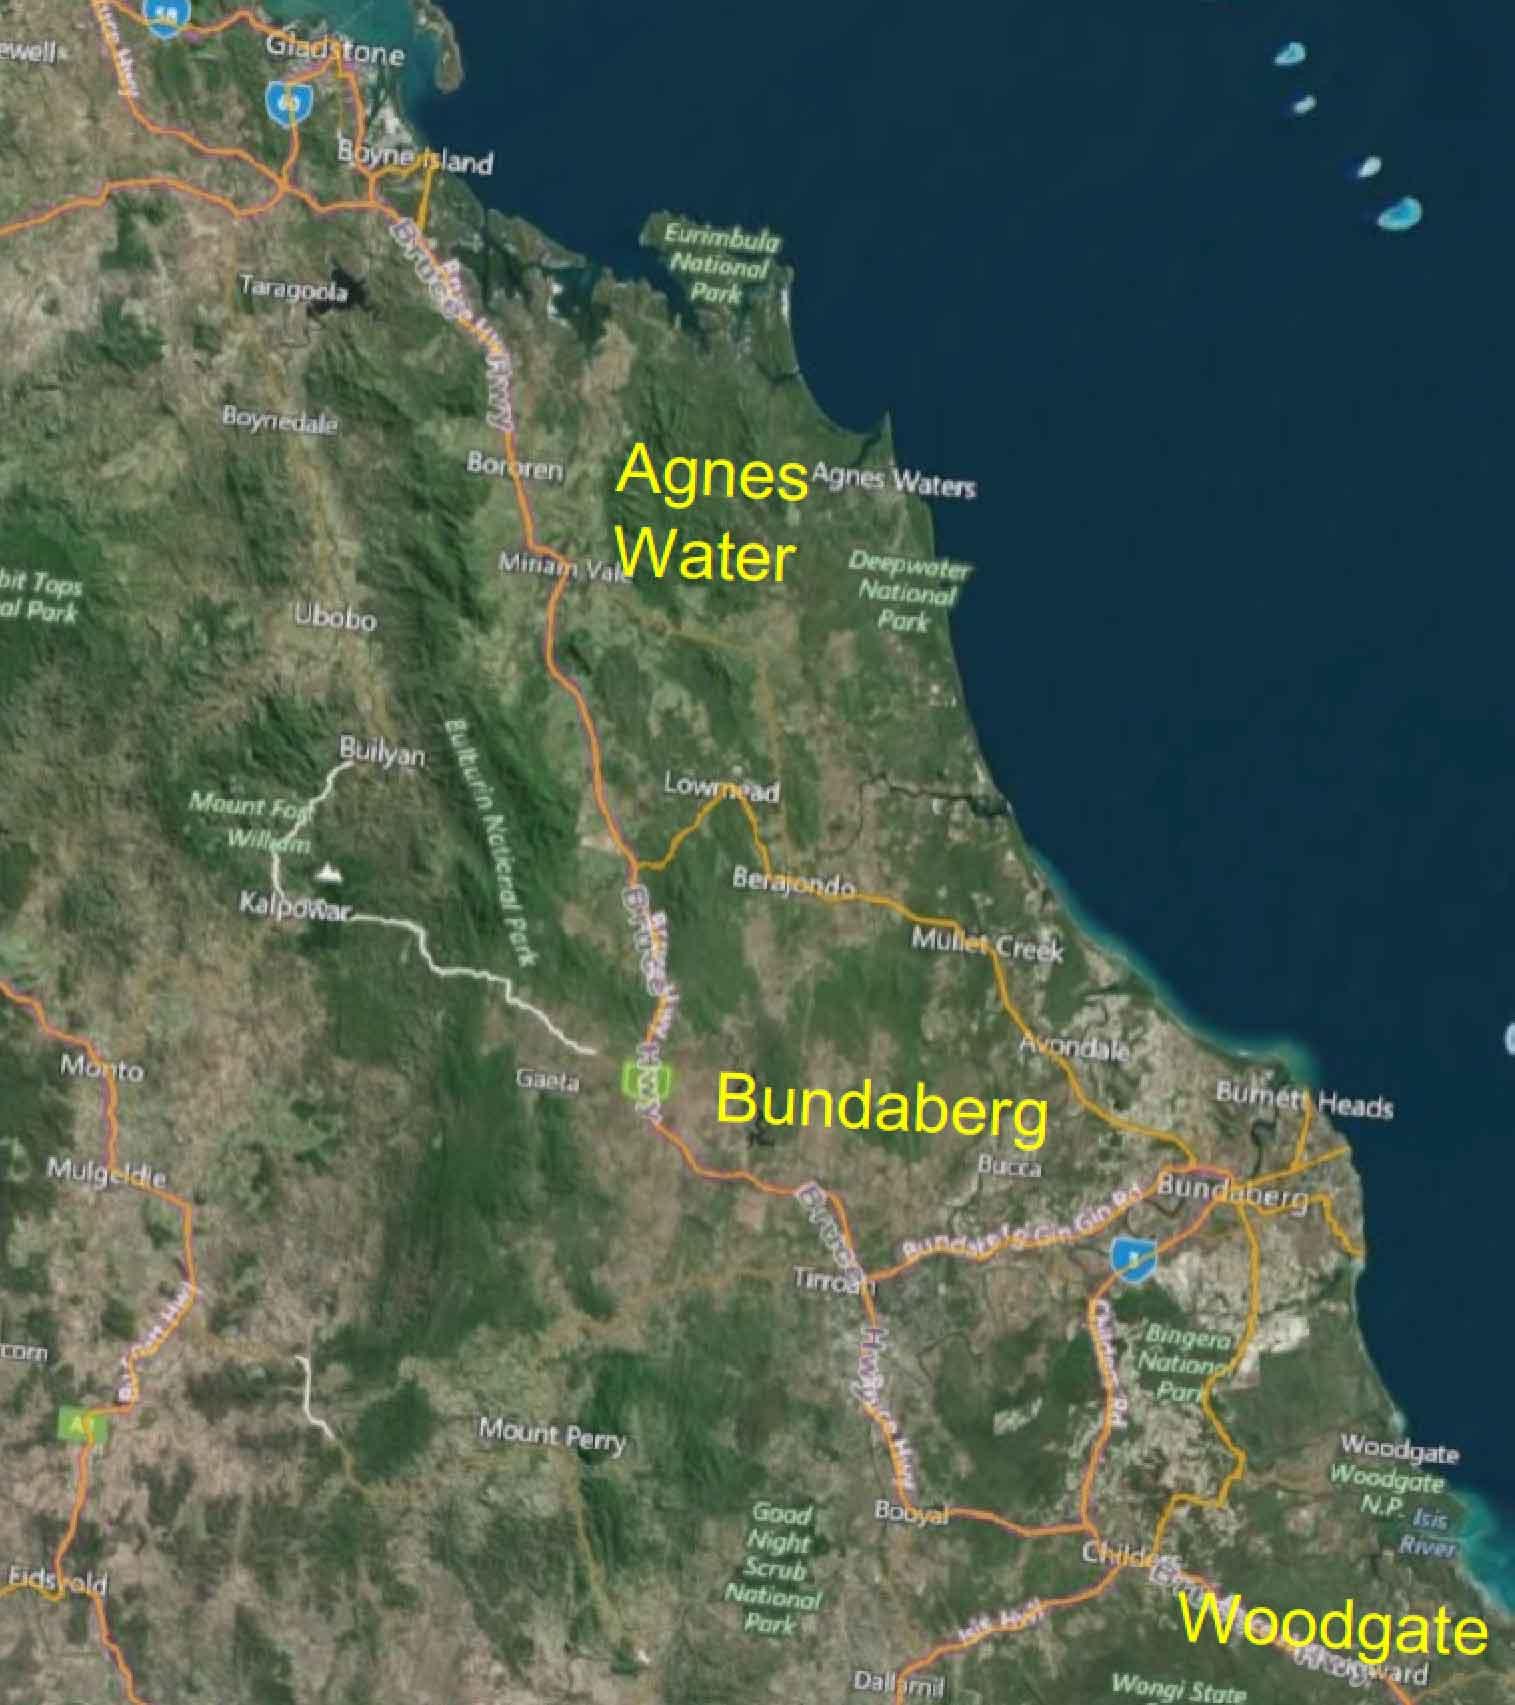 strabent service locations map